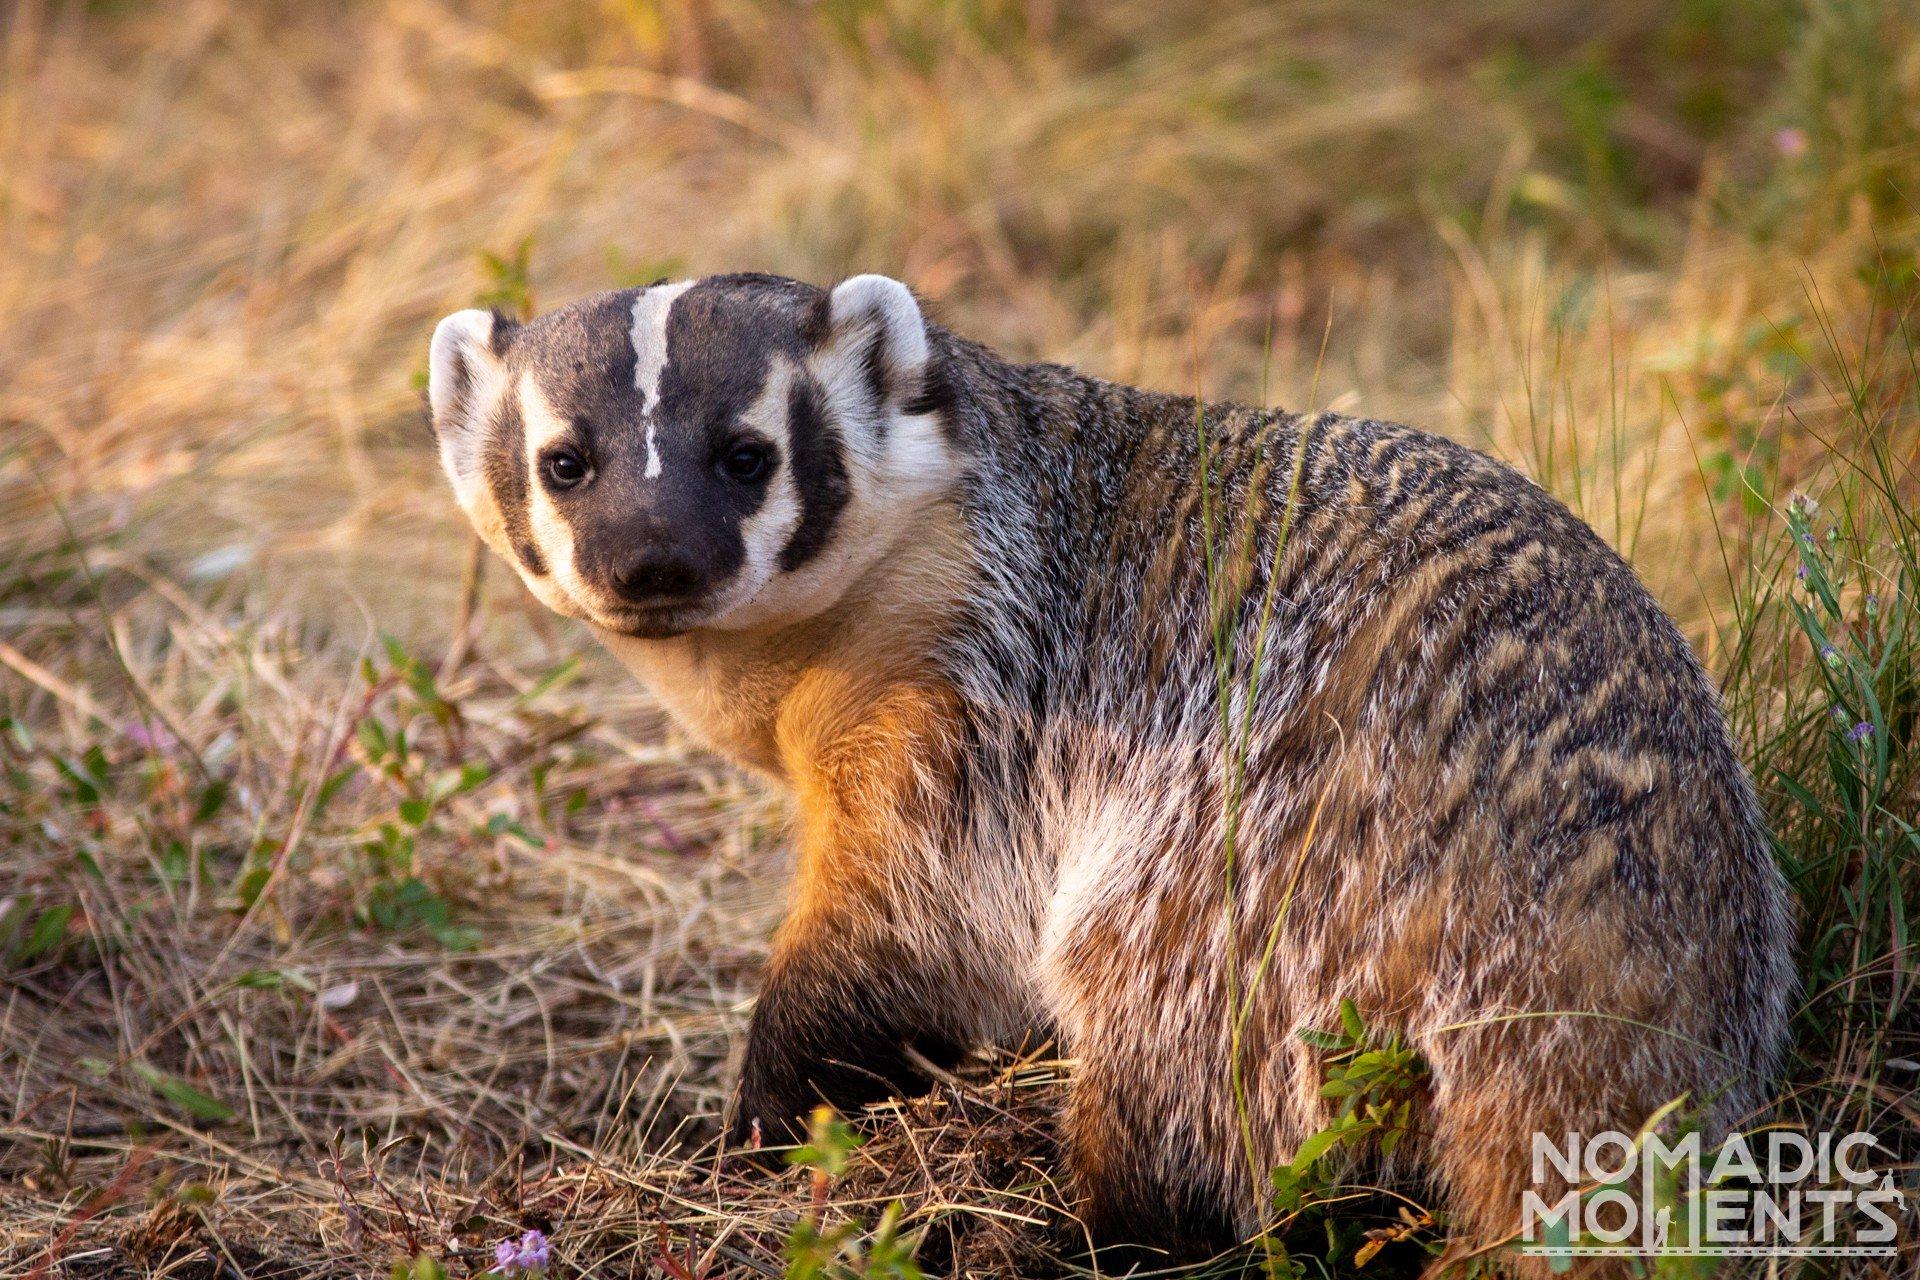 Badger - Highlights of 2020